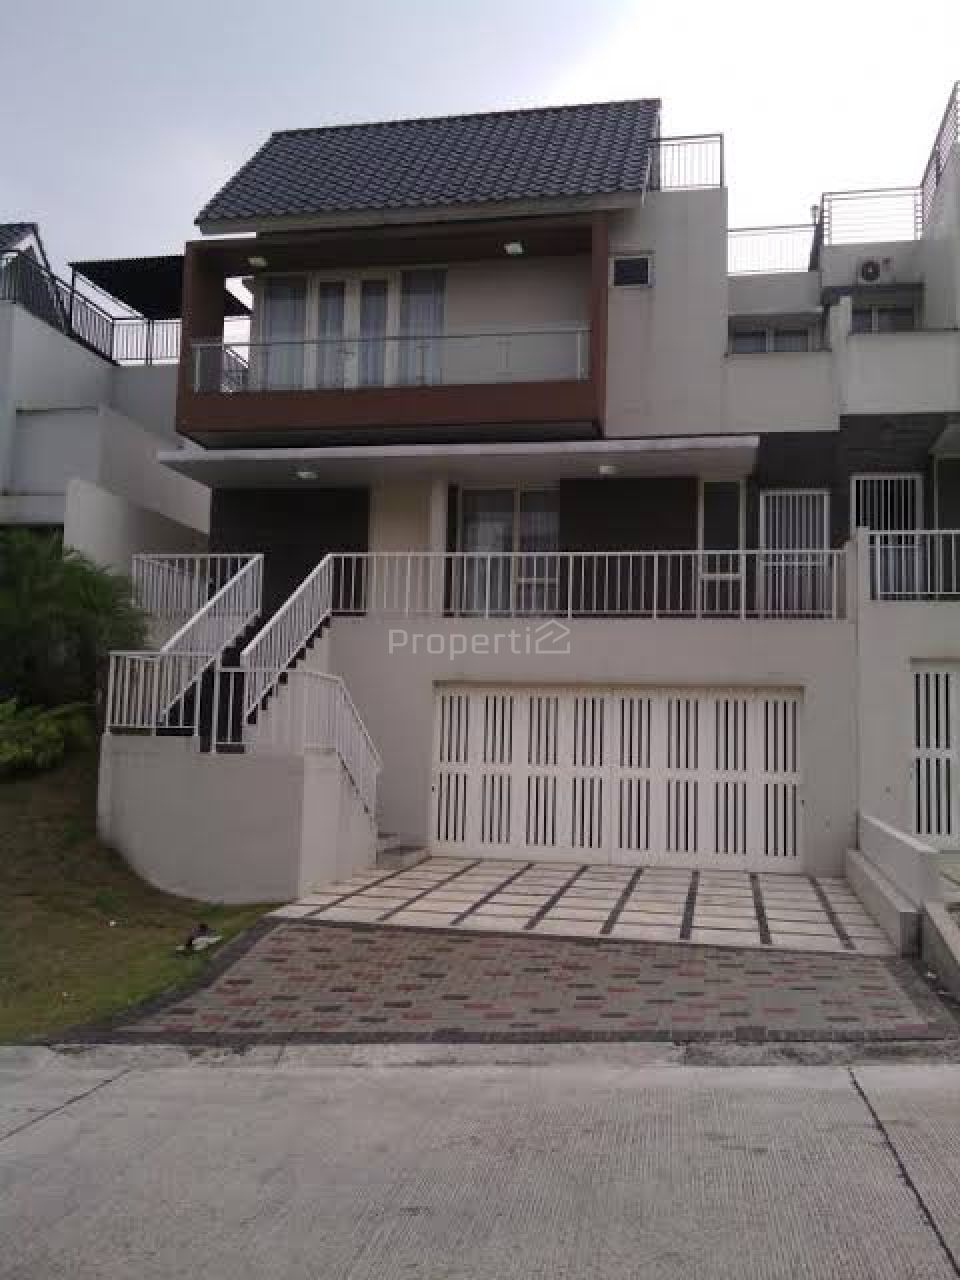 Villa House in Sentul City, Jawa Barat